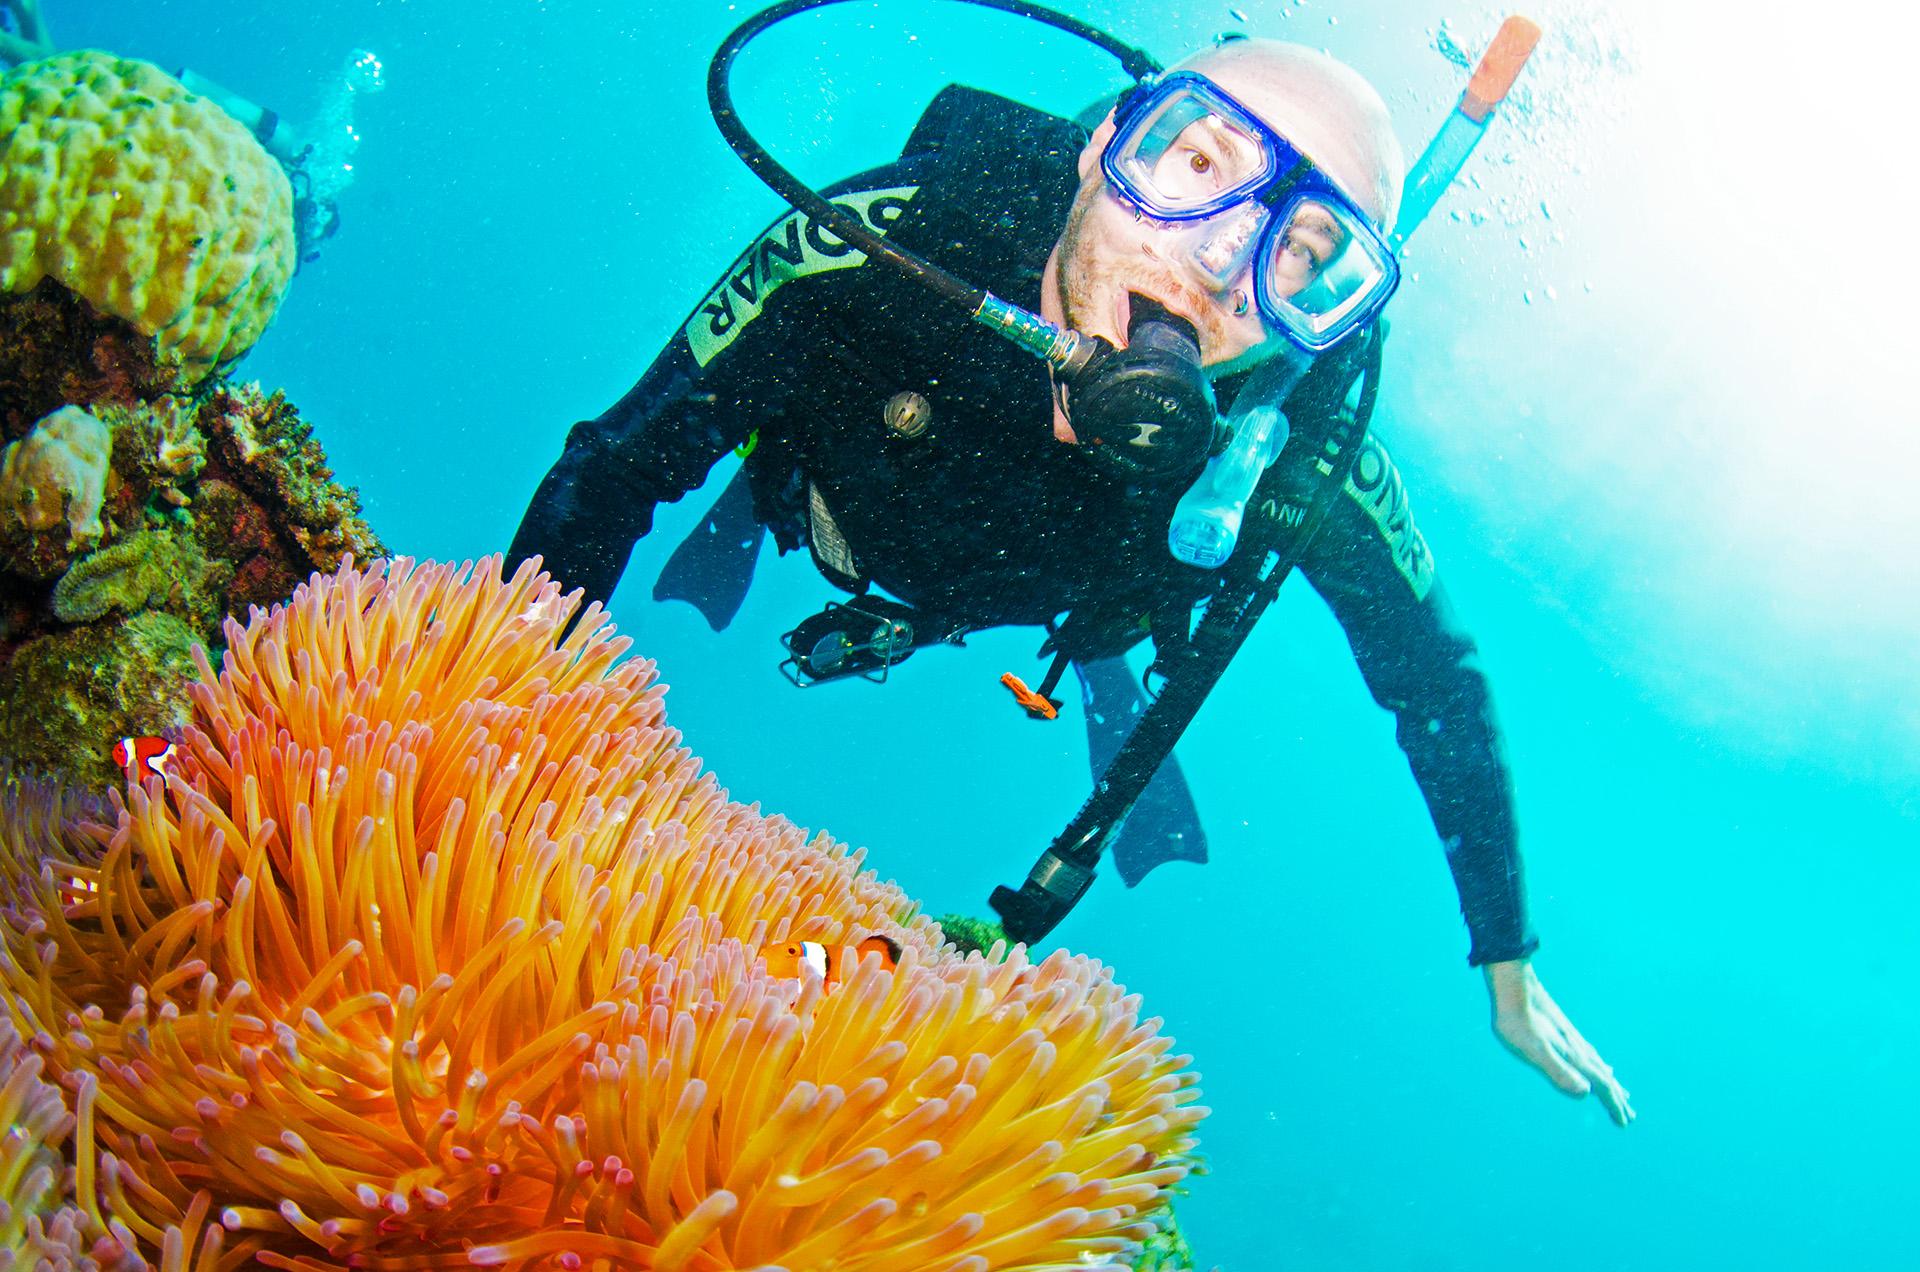 Geoff and Nemo